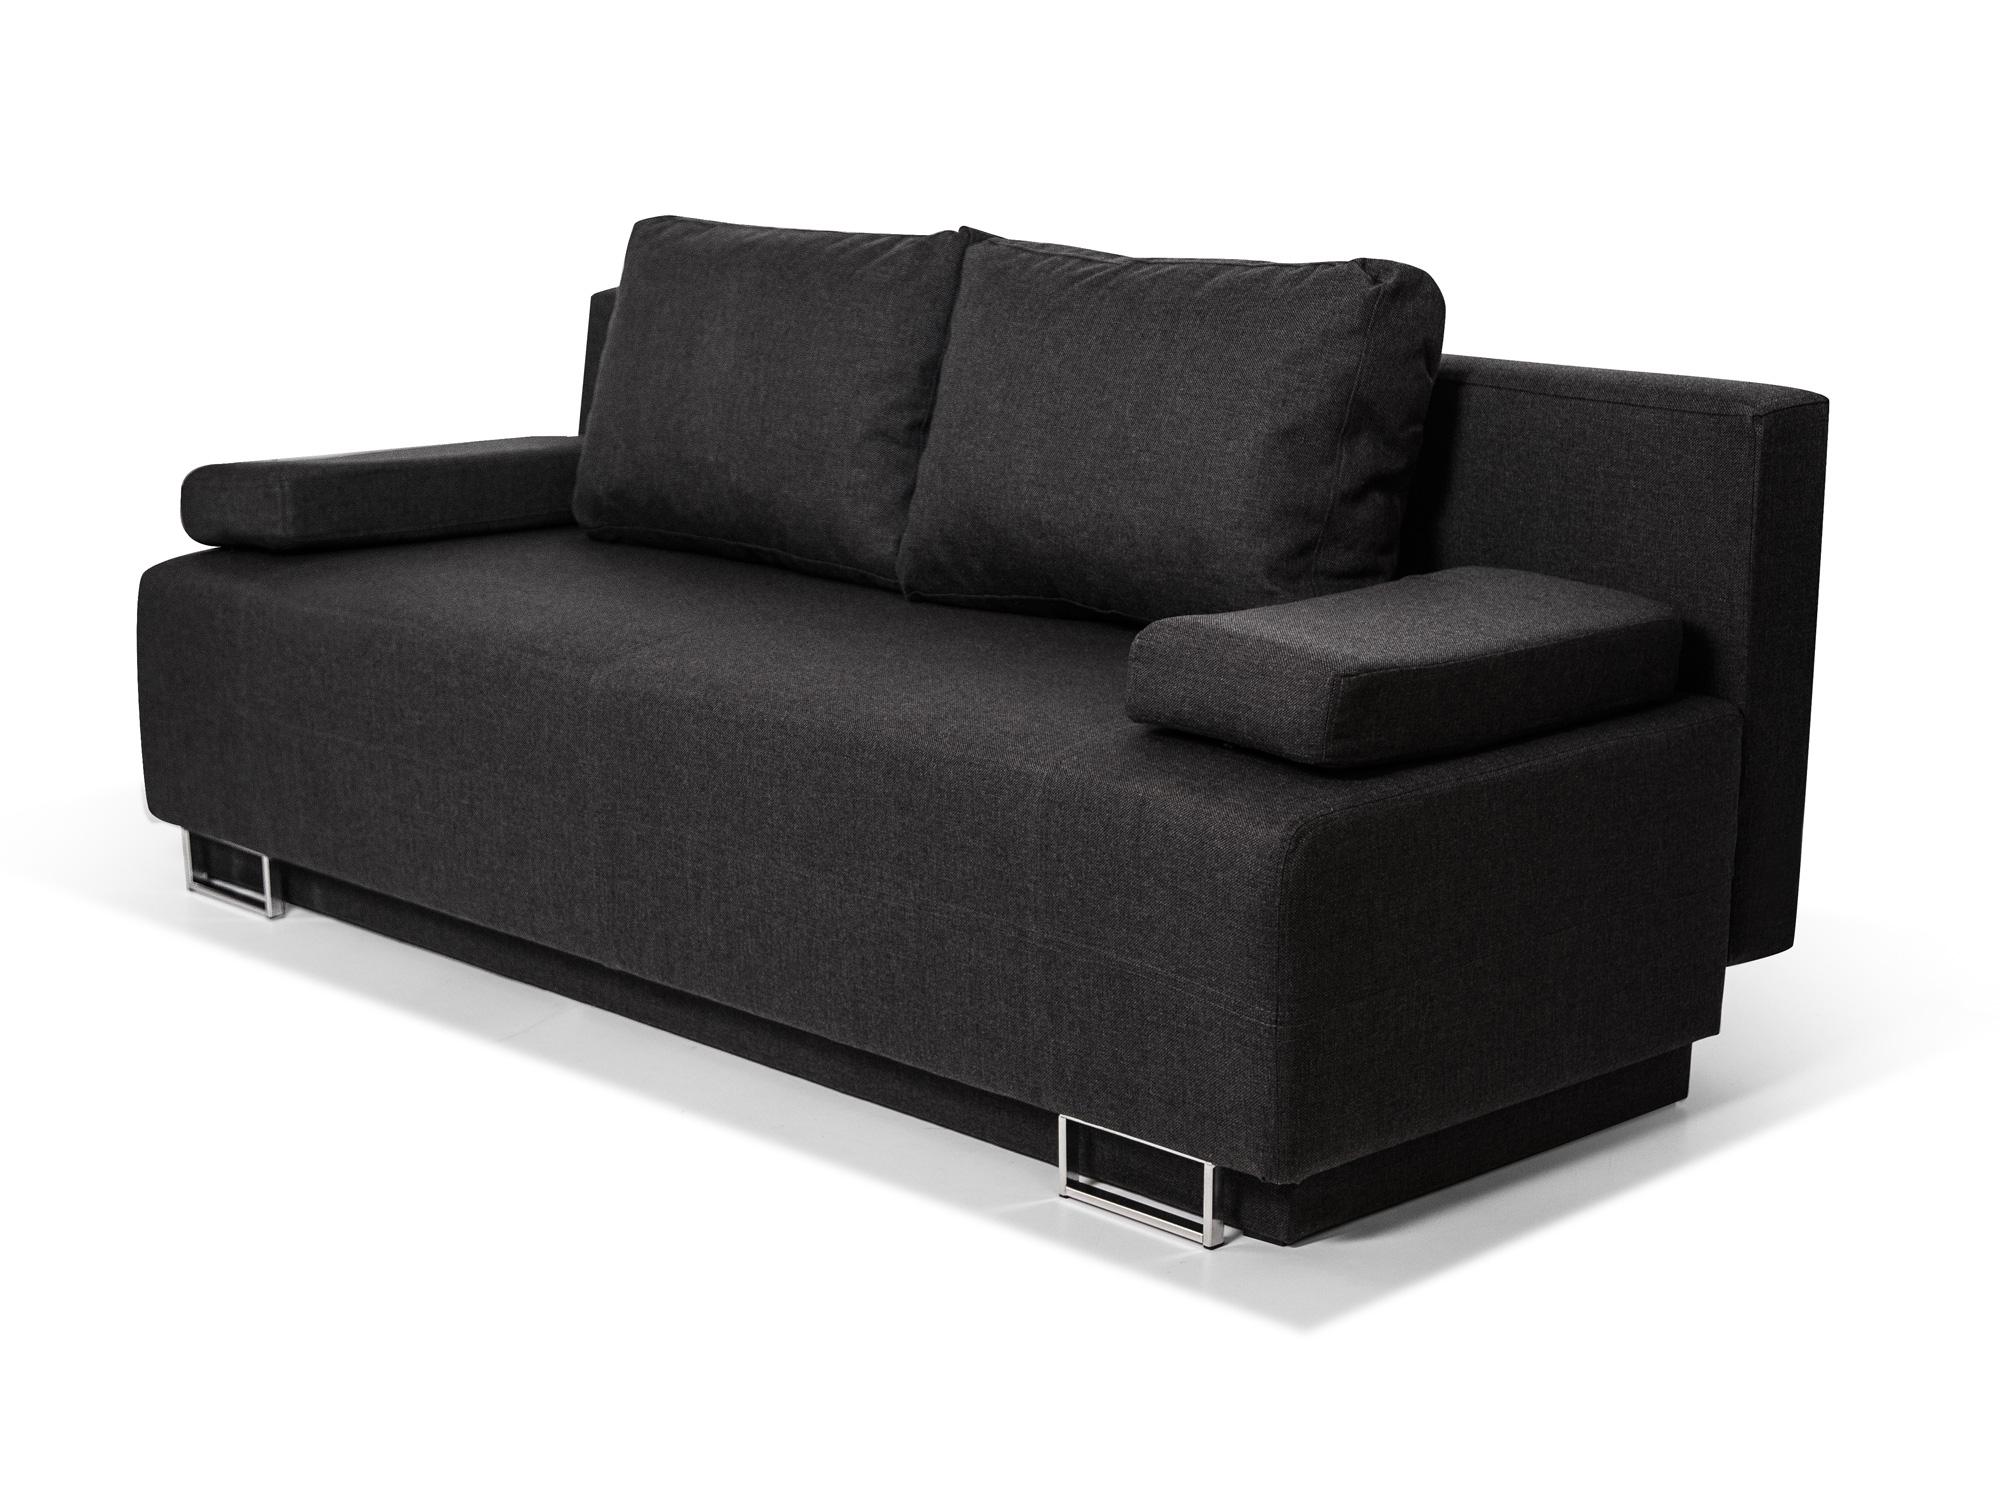 cambridge schlafsofa stoffbezug grau. Black Bedroom Furniture Sets. Home Design Ideas